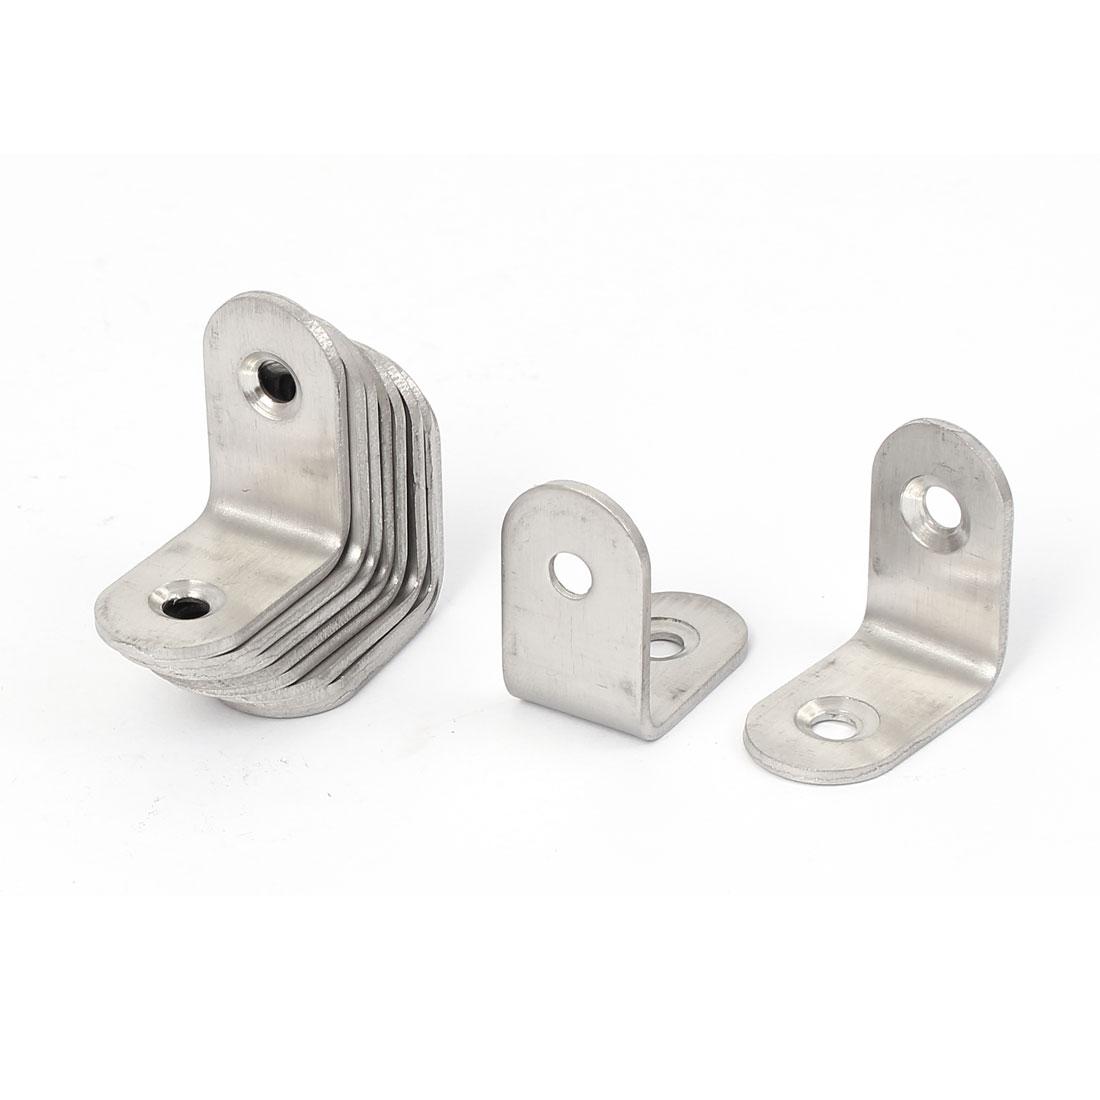 25mmx25mmx2mm 2 Holes Corner Brace Joint Angle Bracket Support 10pcs